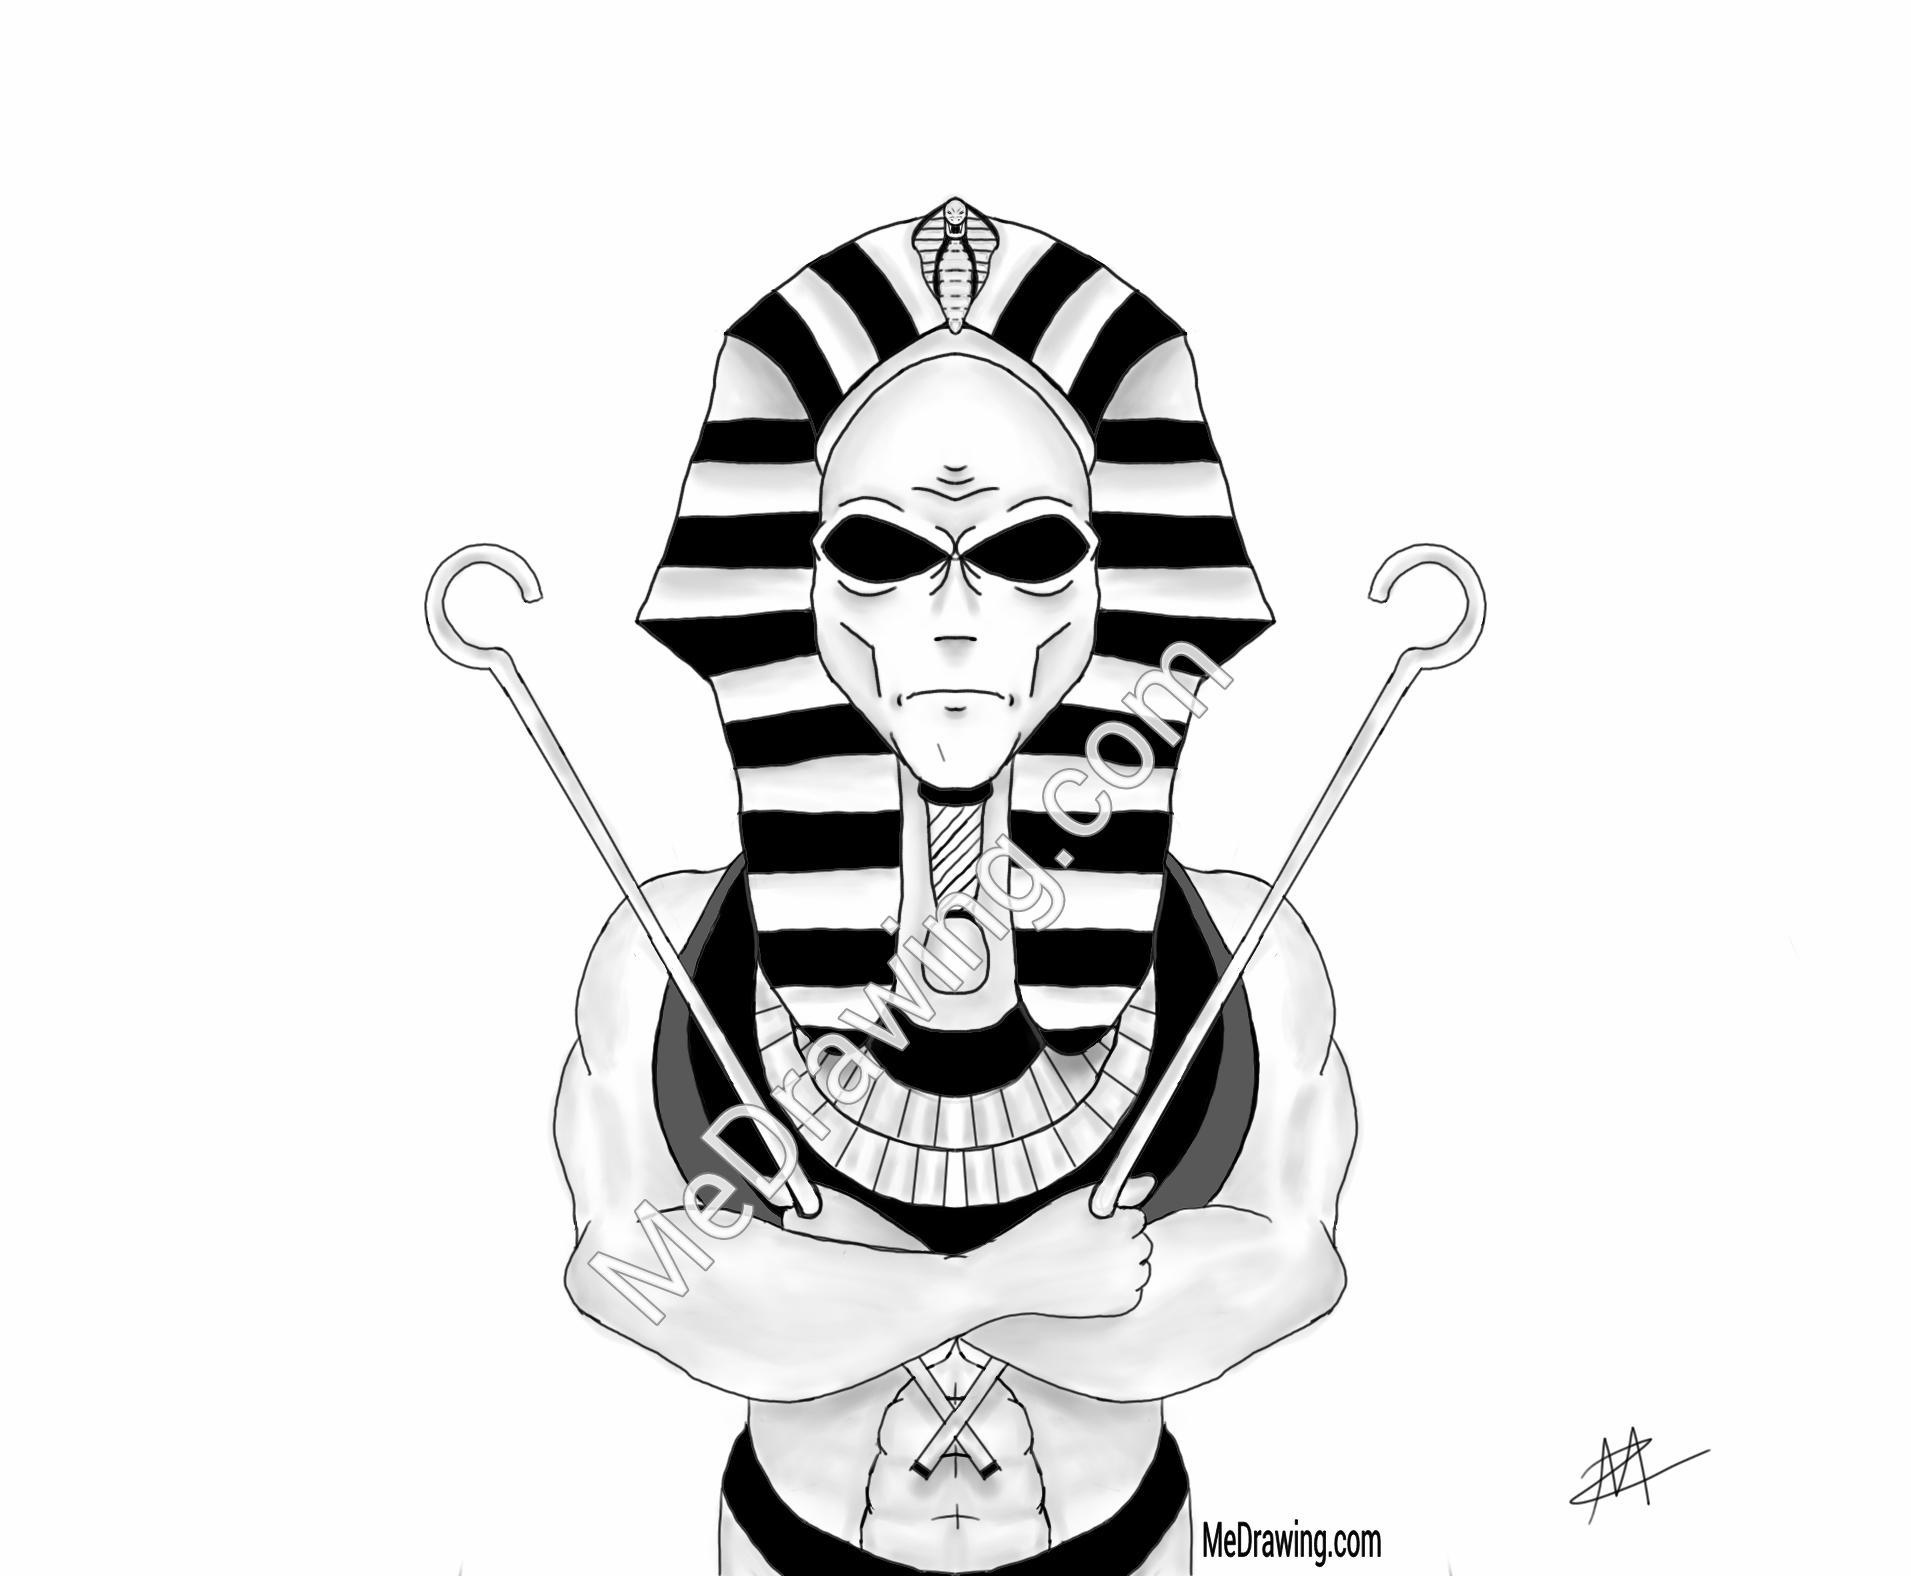 Drawn illuminati alien Pharaoh Aliens Drawing Aliens Egyptian